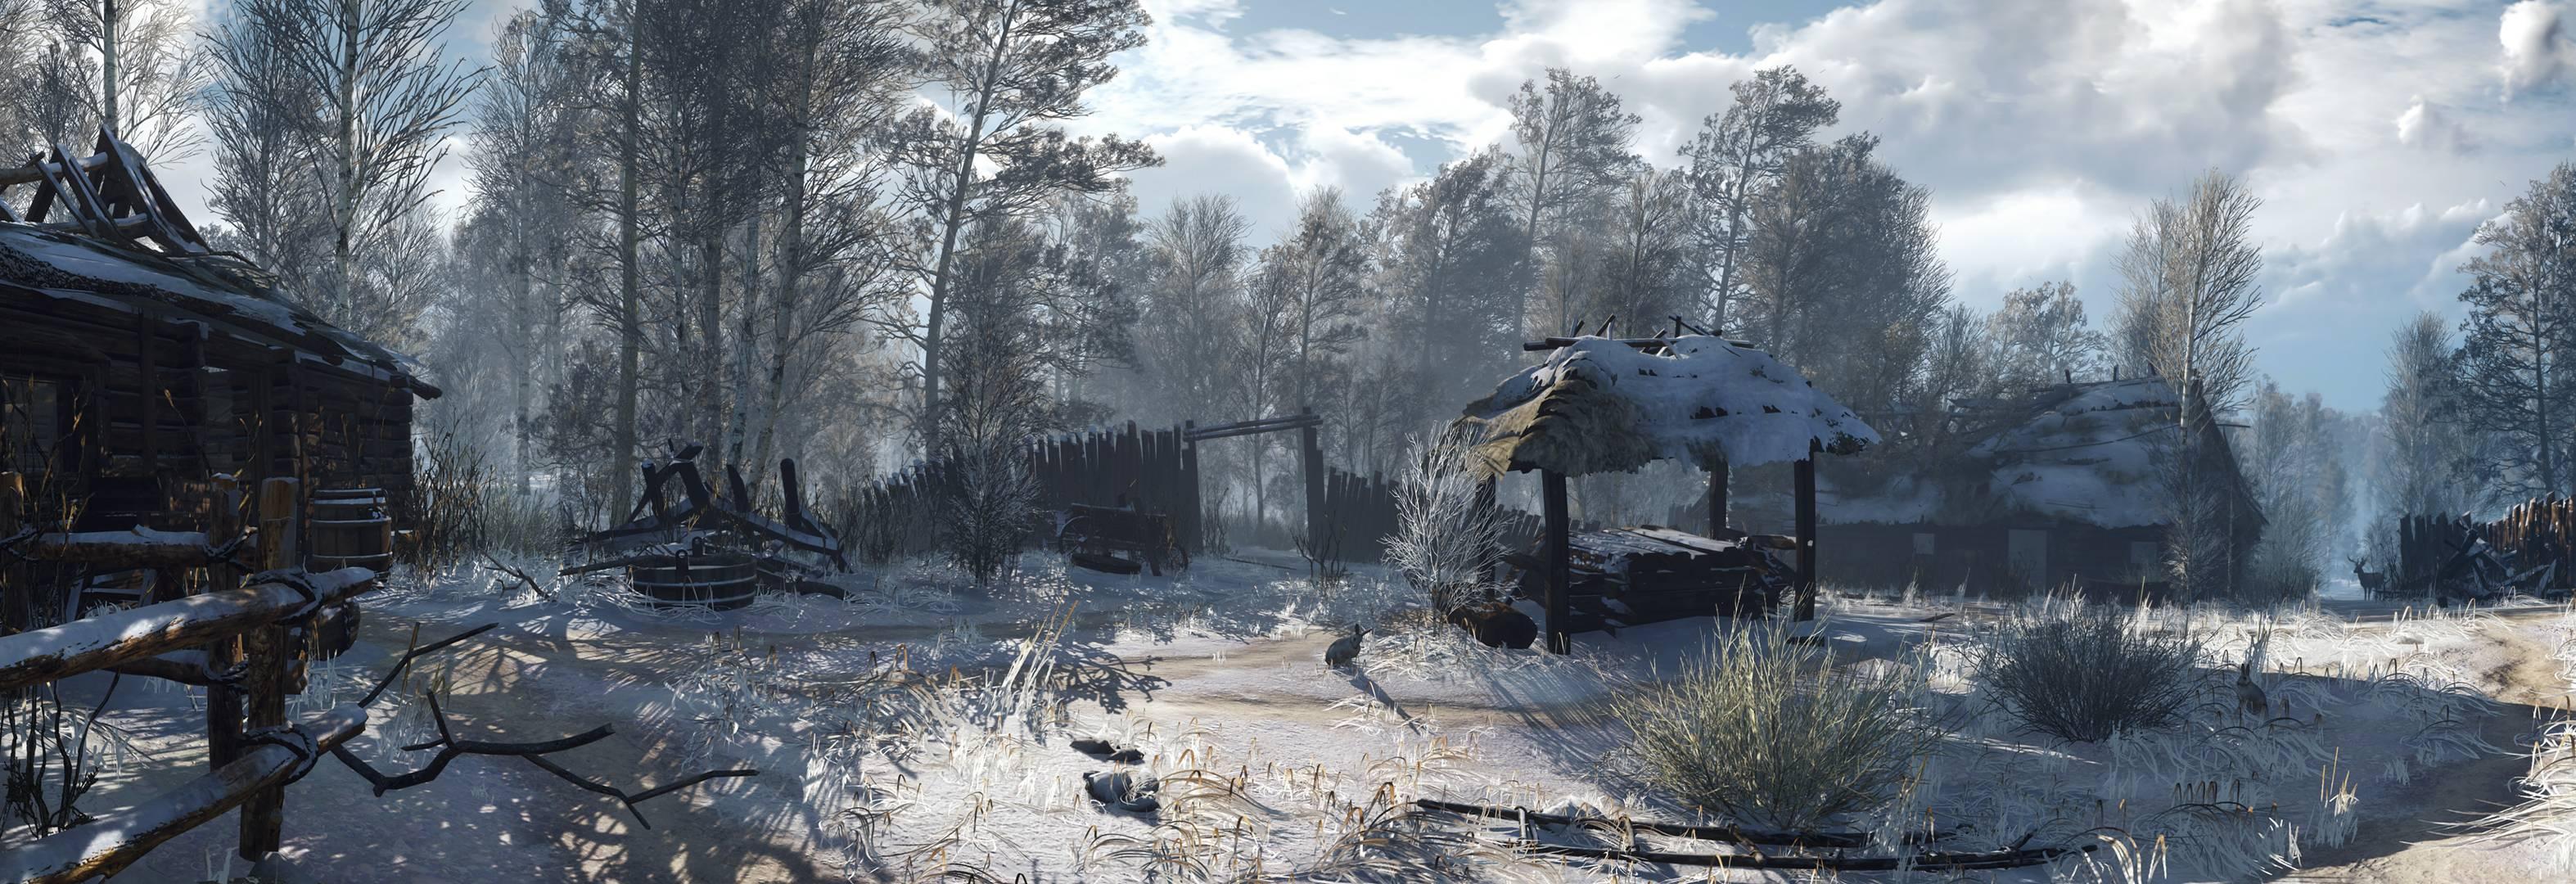 wintersbreath-ruins.jpg